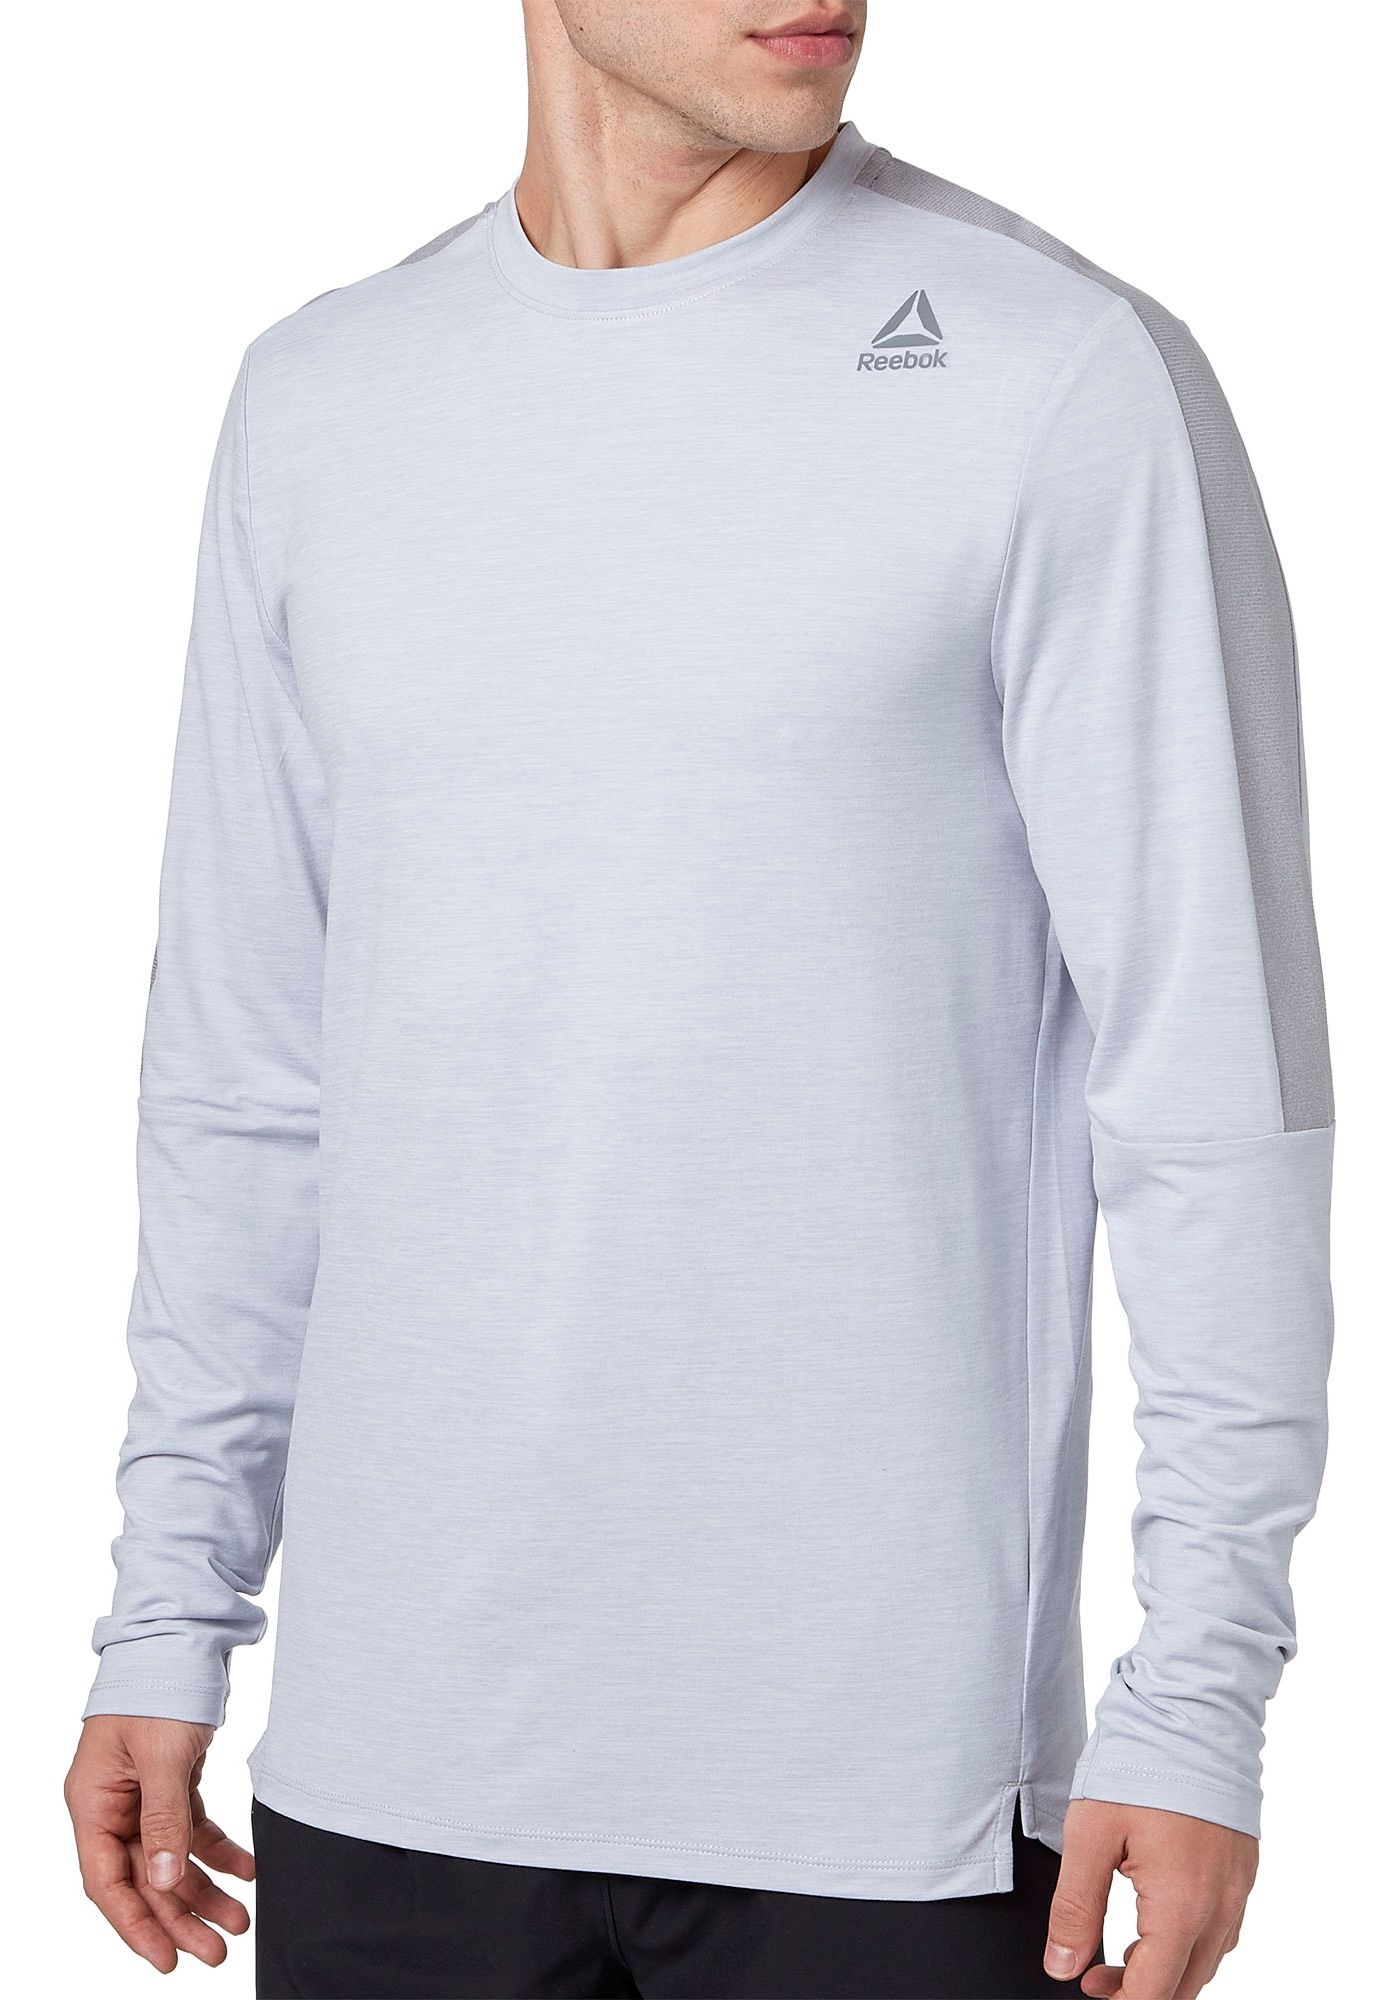 Reebok Men's 24/7 Crewneck Long Sleeve Shirt